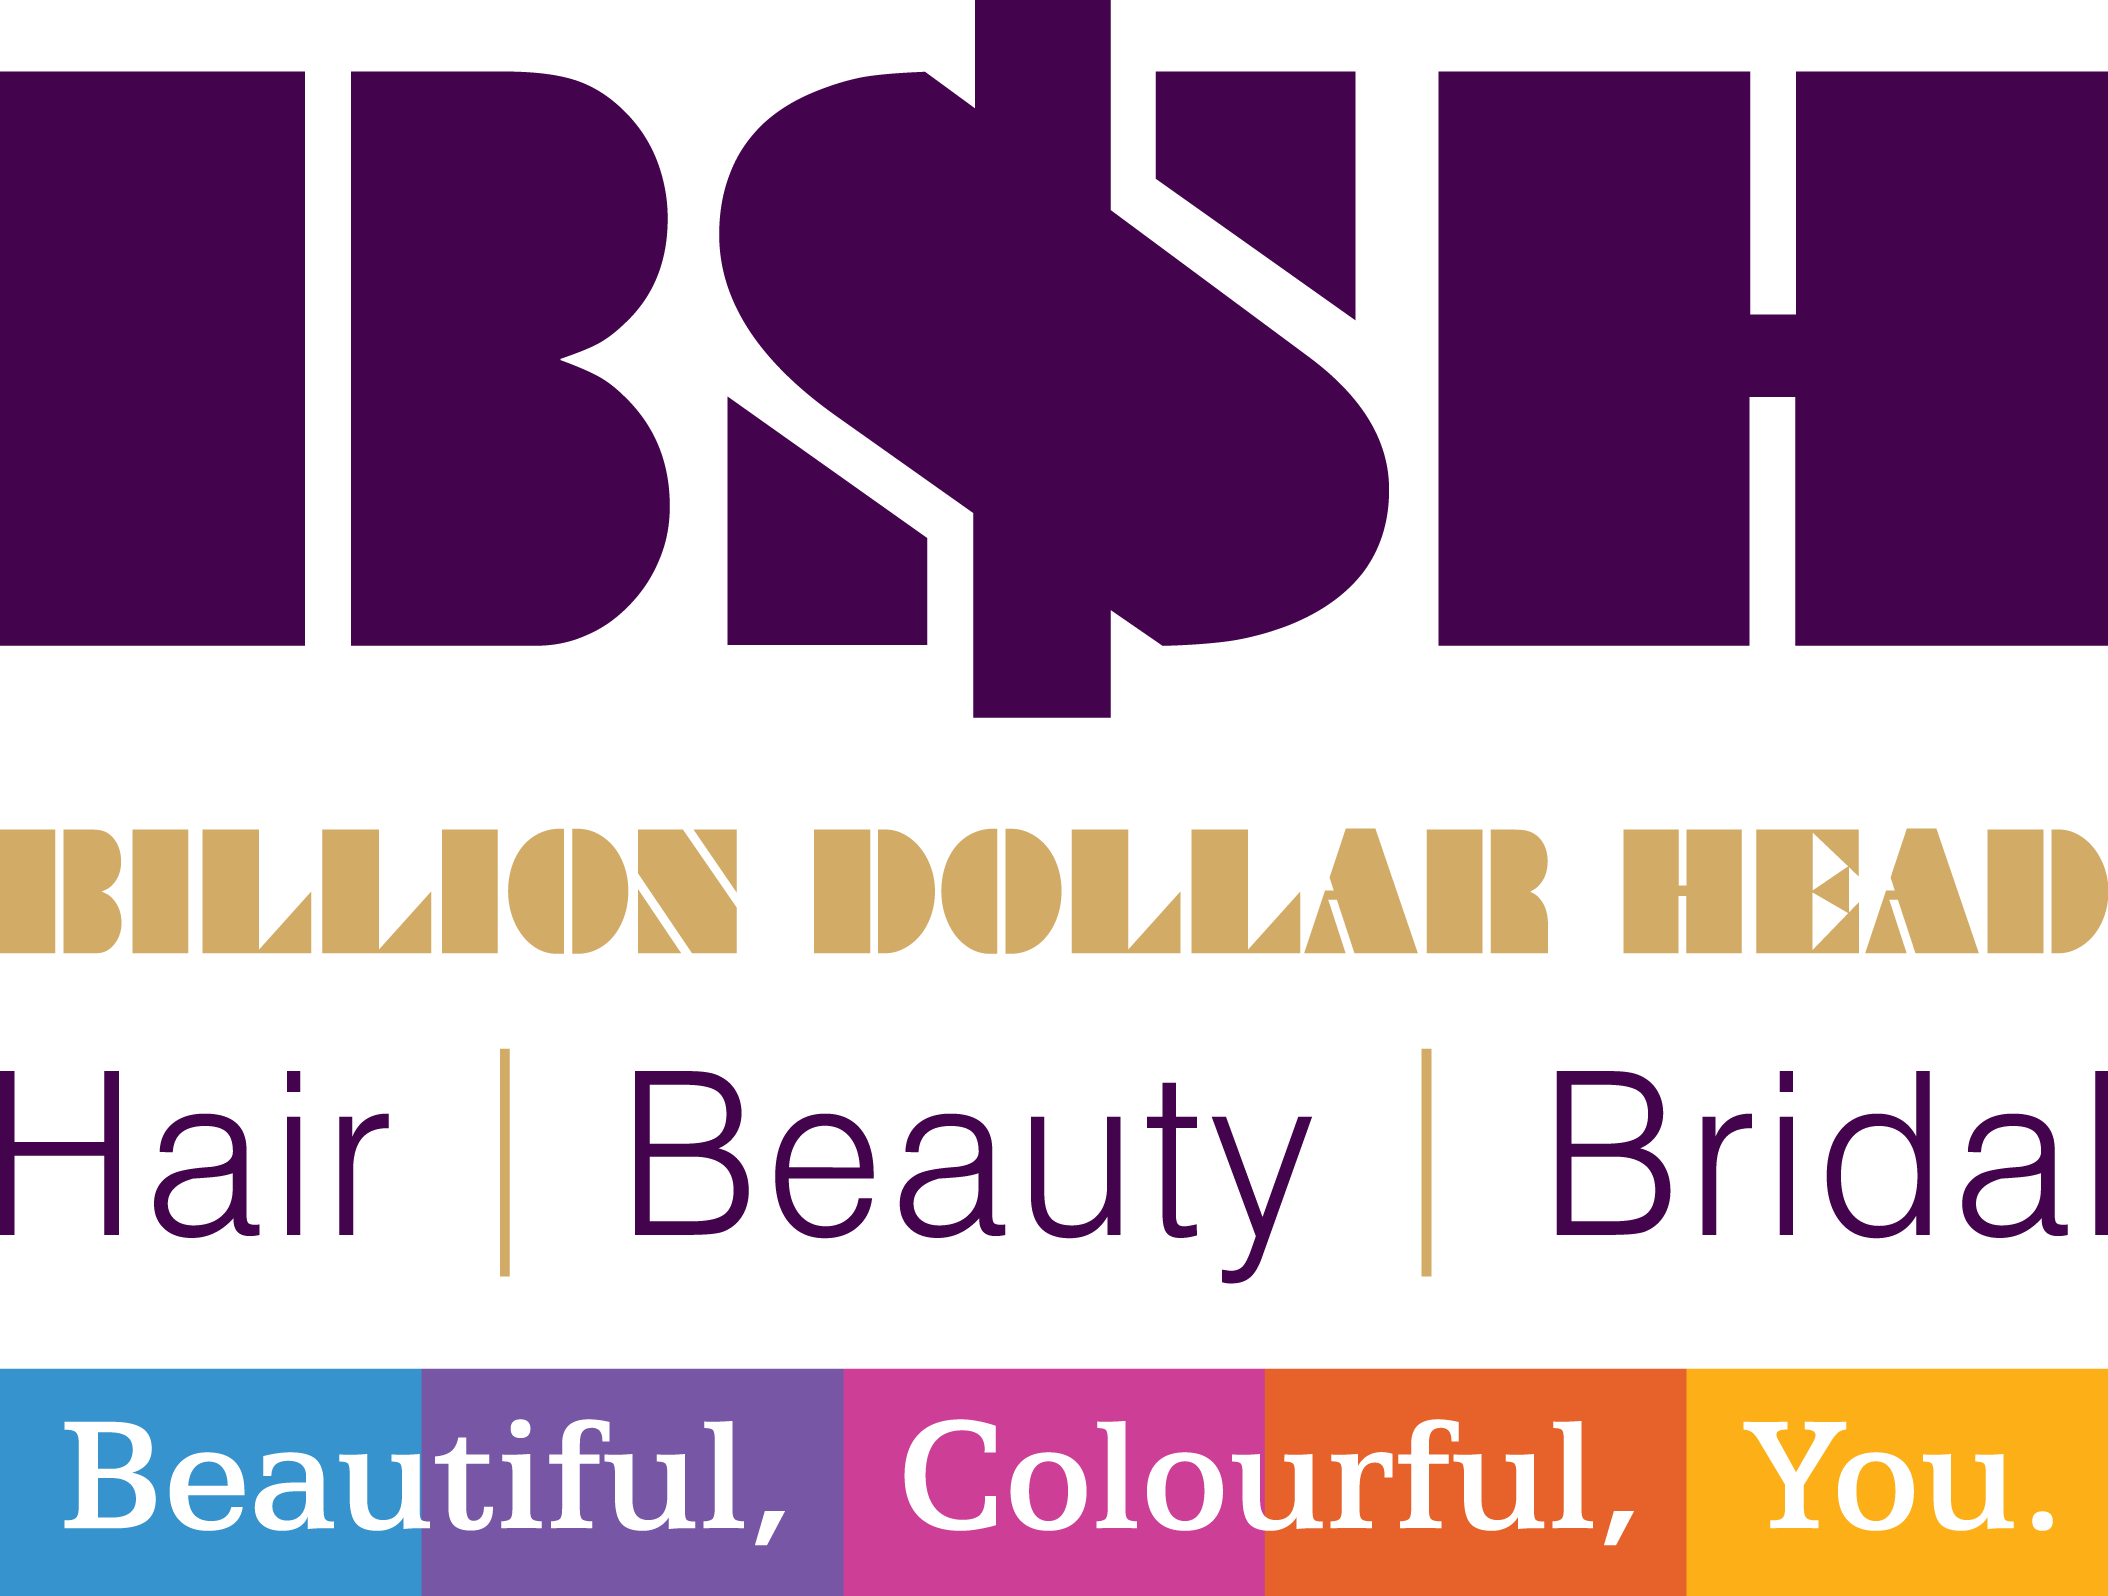 Billion Dollar Head Logo